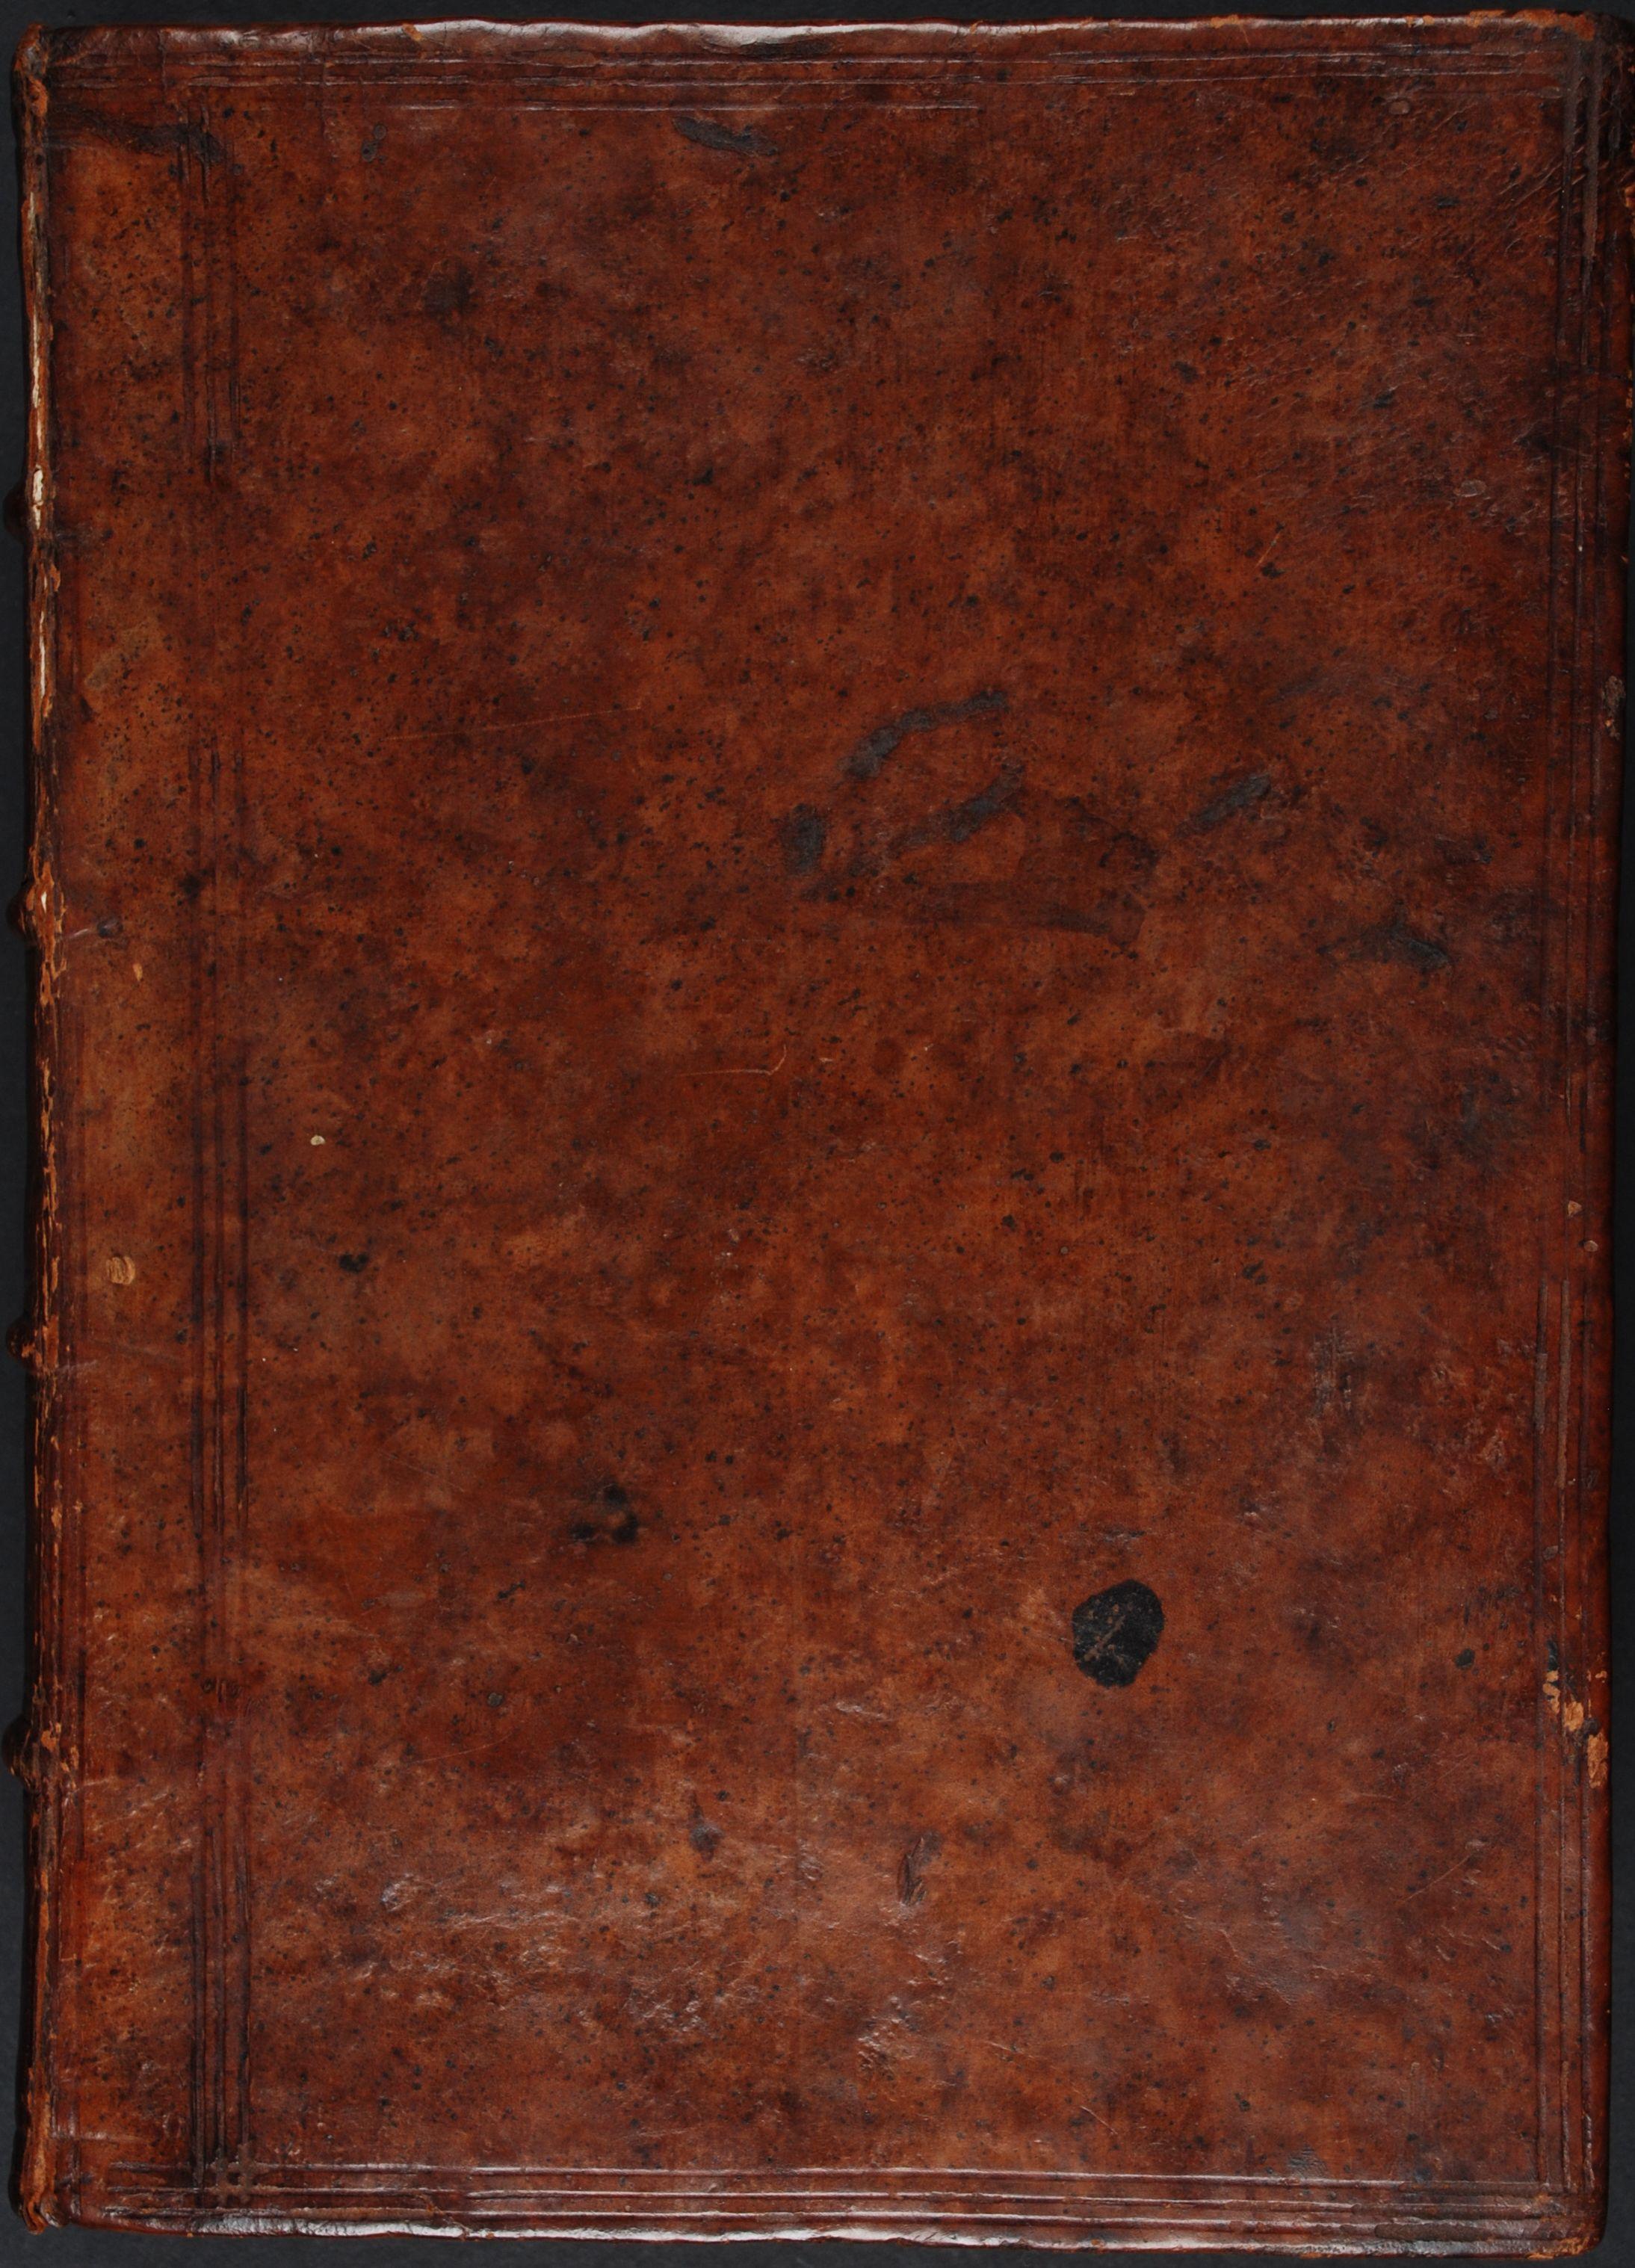 Jacobus de Voragine. Legenda aurea sanctorum, sive Lombardica historia. Cologne: Conrad Winters, 1476.